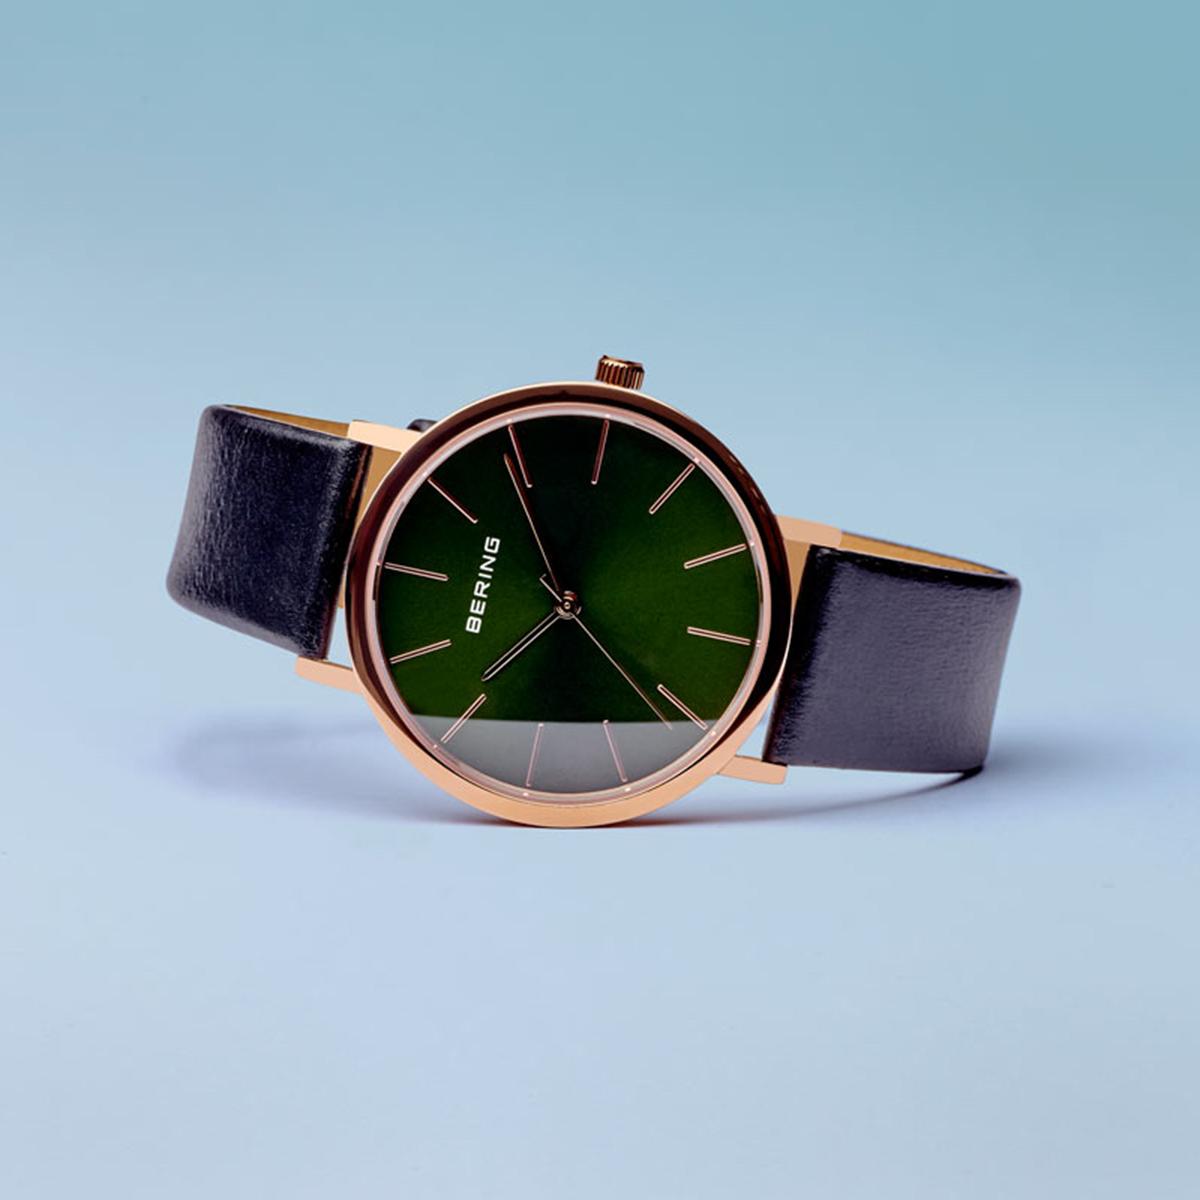 Zegarek damski Bering classic 13436-469 - duże 3